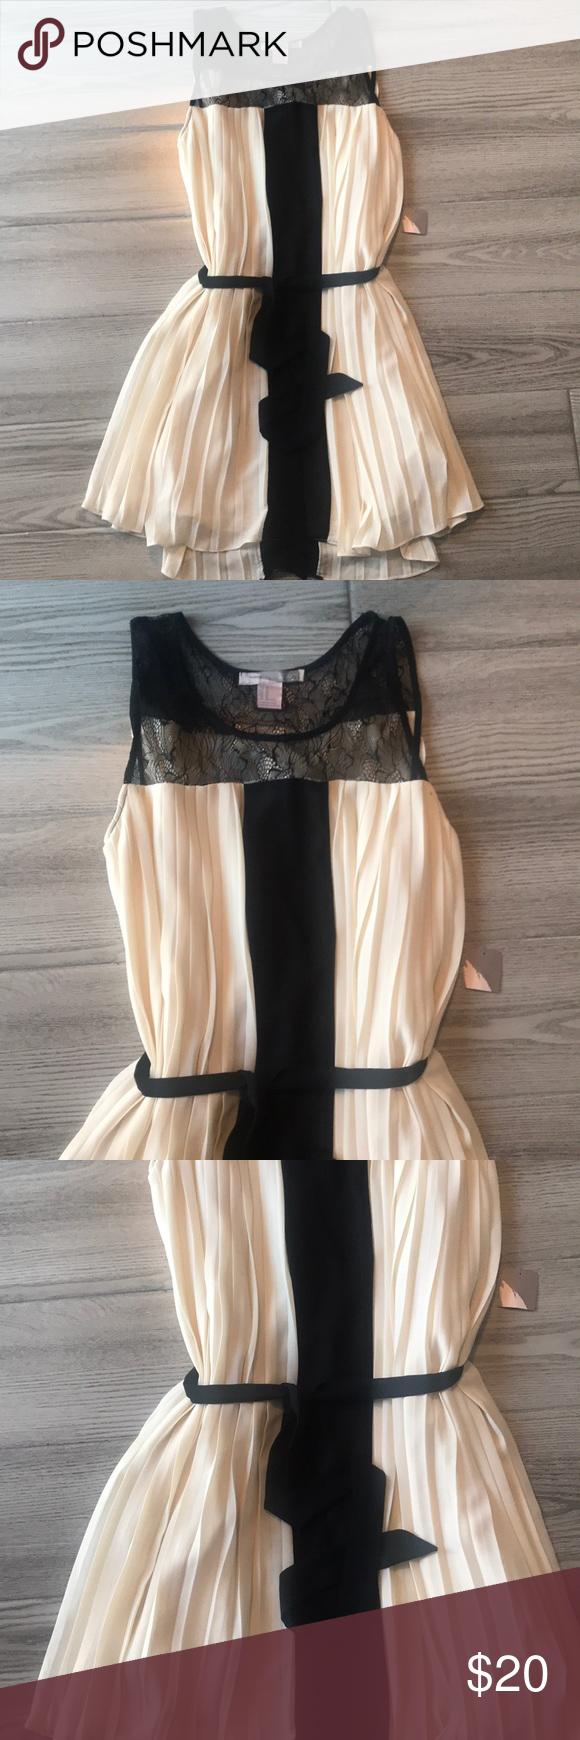 Cream And Black Dress Black Dress Cream Dress Dresses [ 1740 x 580 Pixel ]